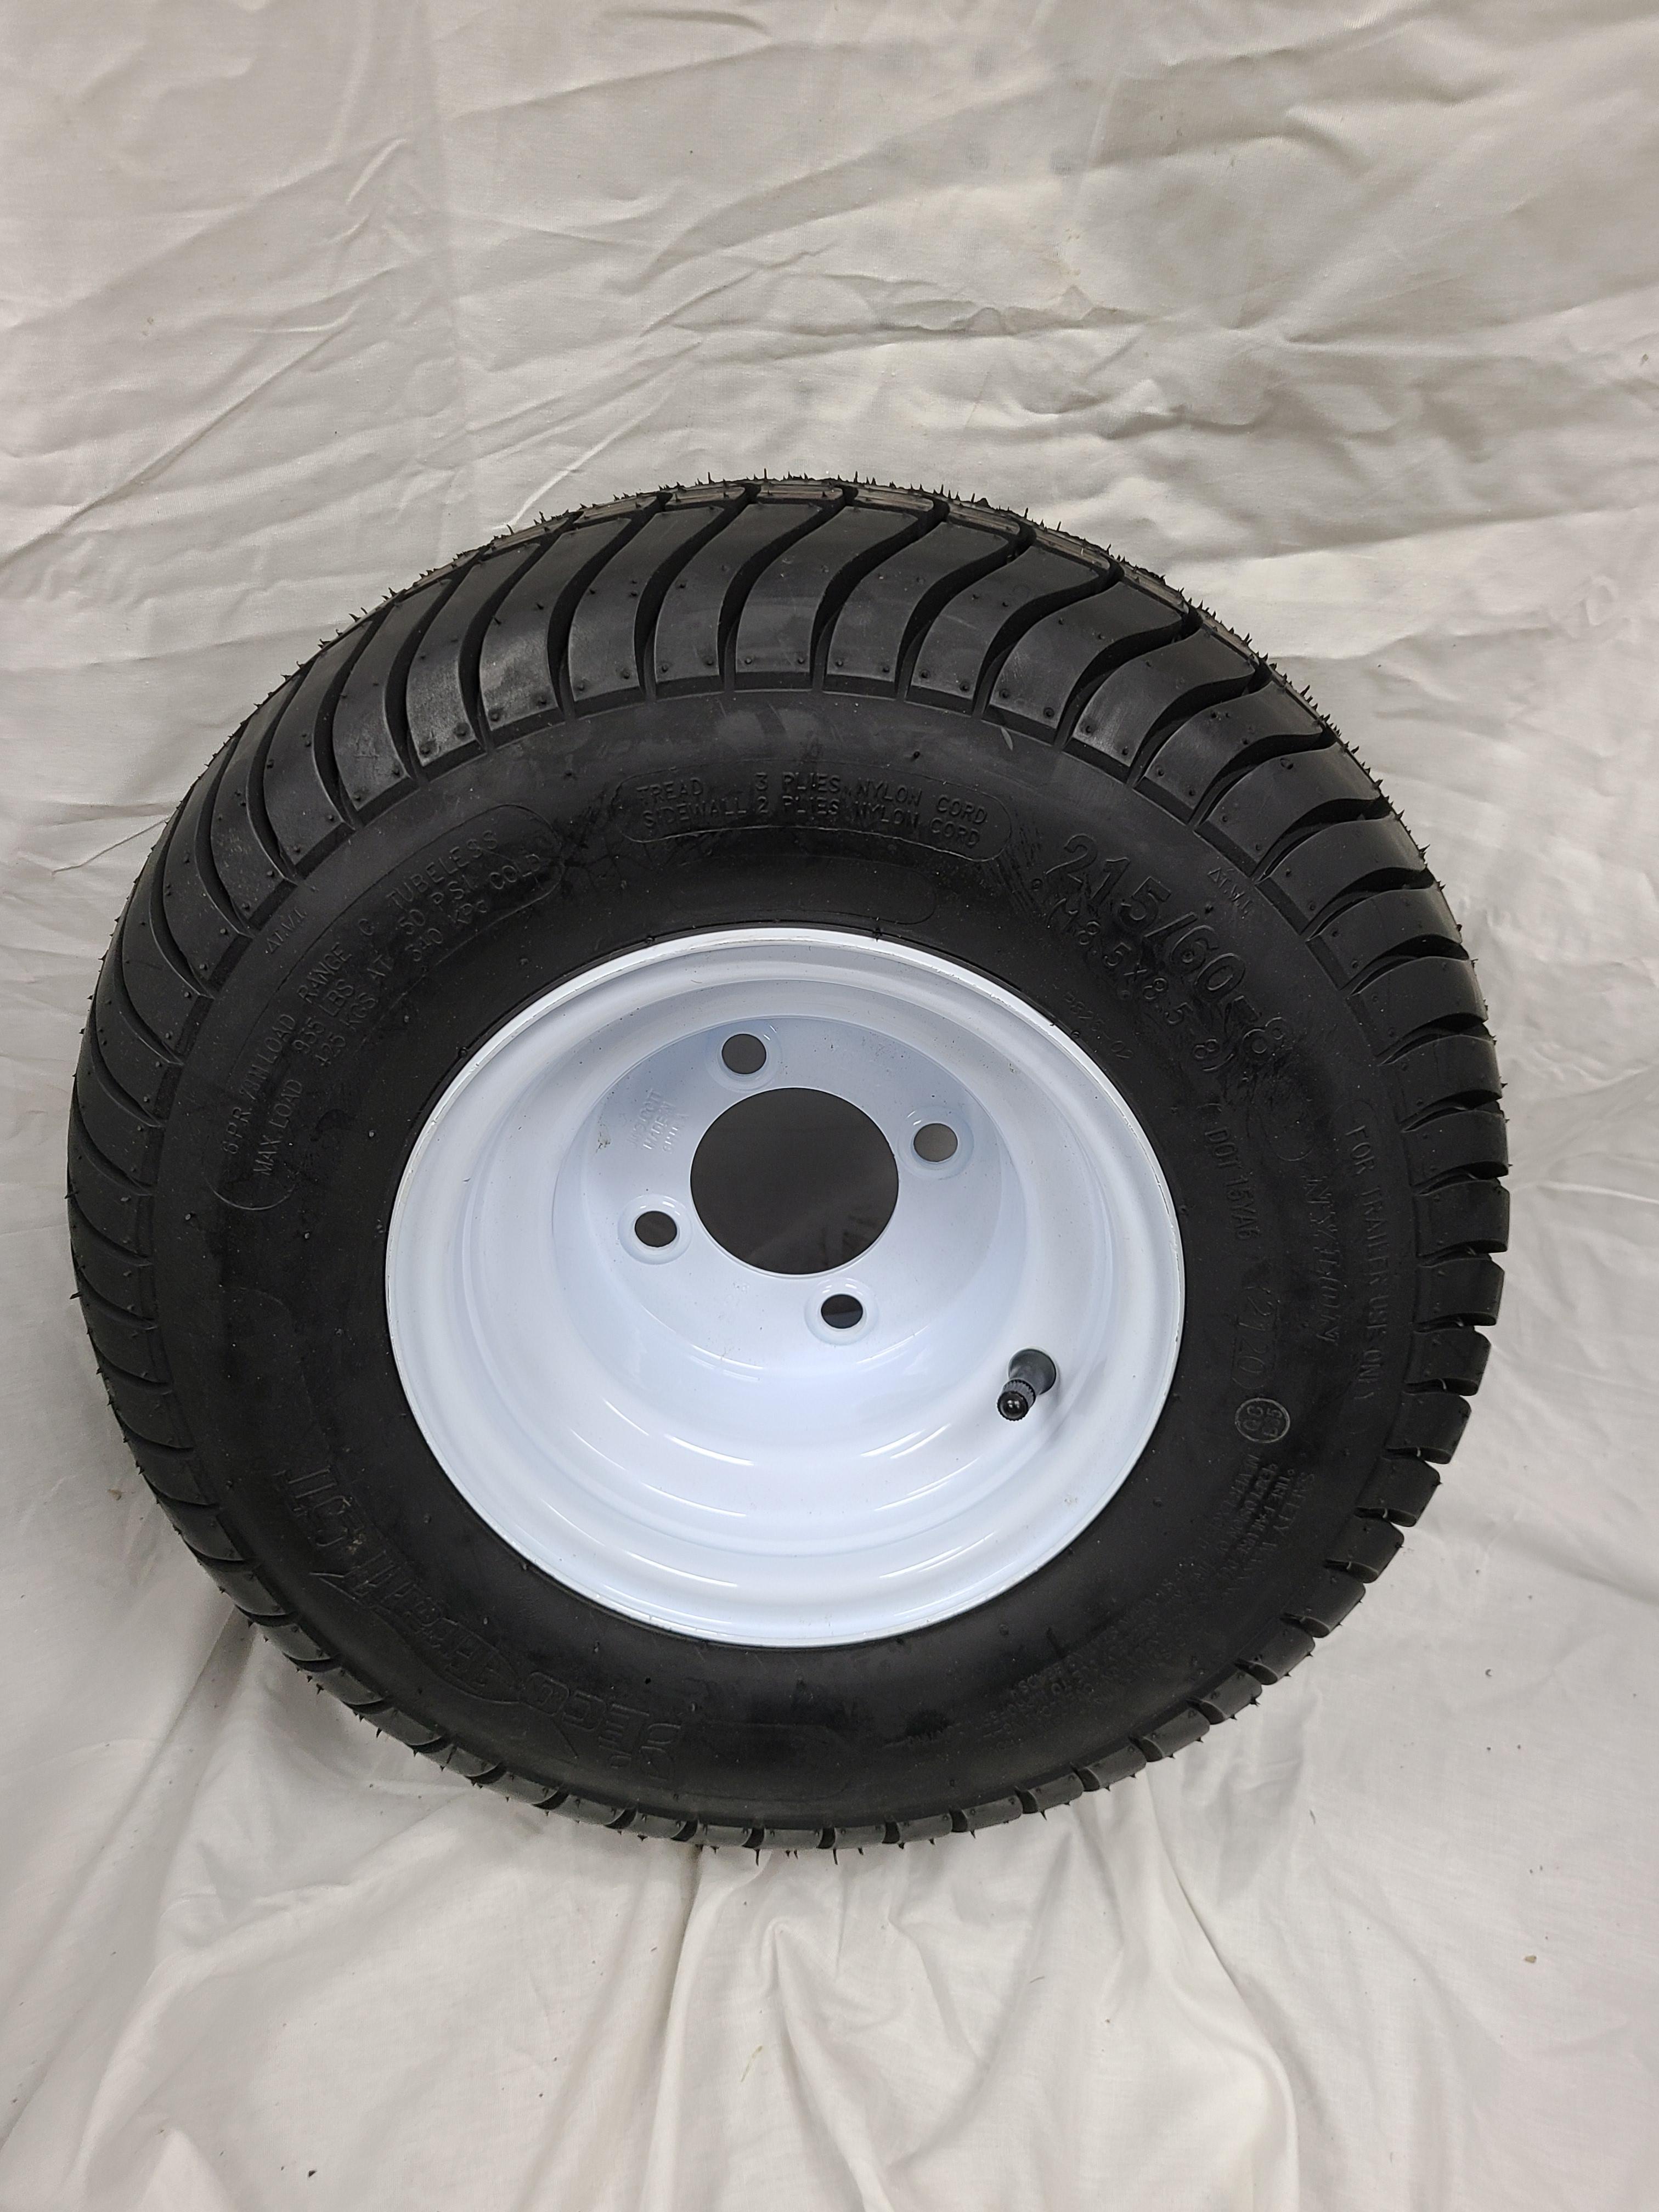 18.5X8.5X8 Trailer Tire 4 Lug Wheel